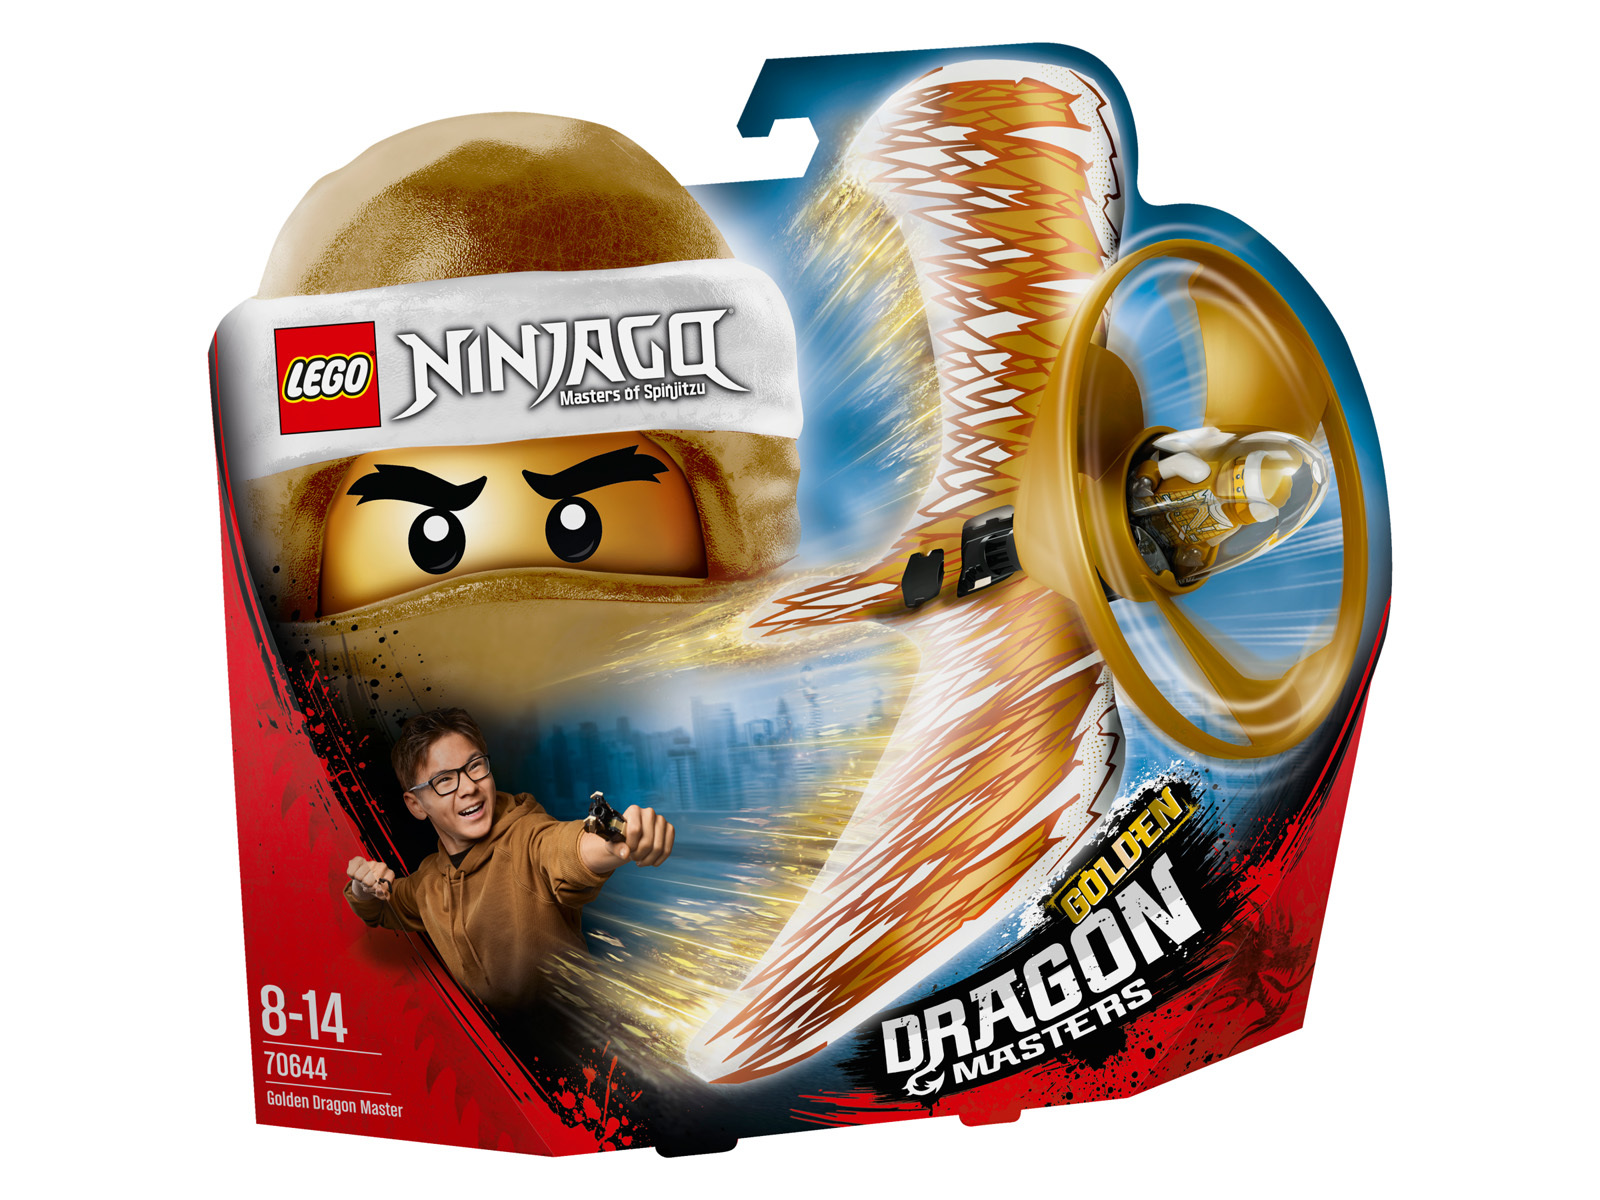 70644 - Maestro dragone d'oro - Lego Ninjago - Toys Center LEGO NINJAGO Unisex 12+ Anni, 5-8 Anni, 8-12 Anni ALTRI